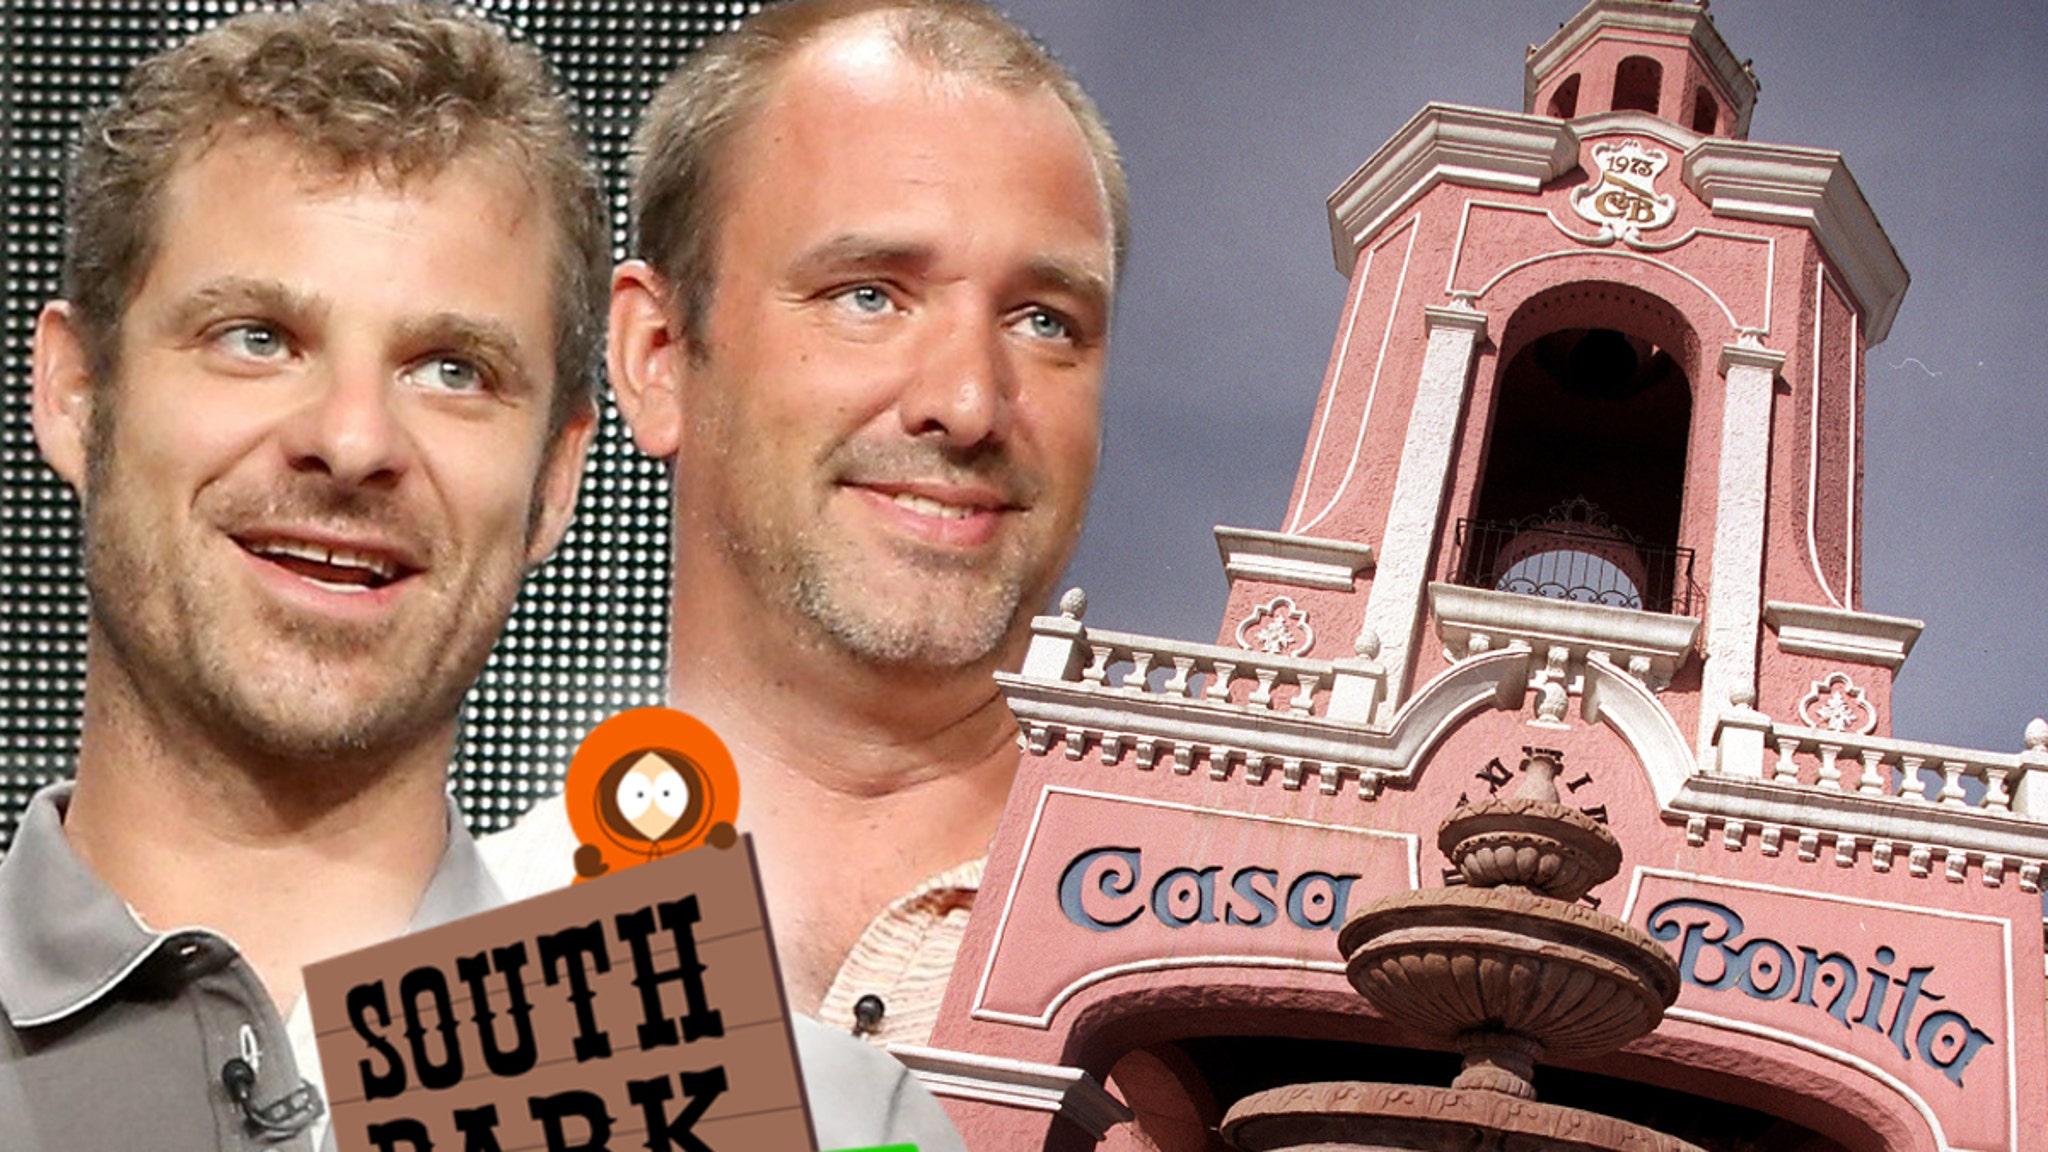 'South Park' Creators Quickly Put Together Deal to Buy Real Casa Bonita